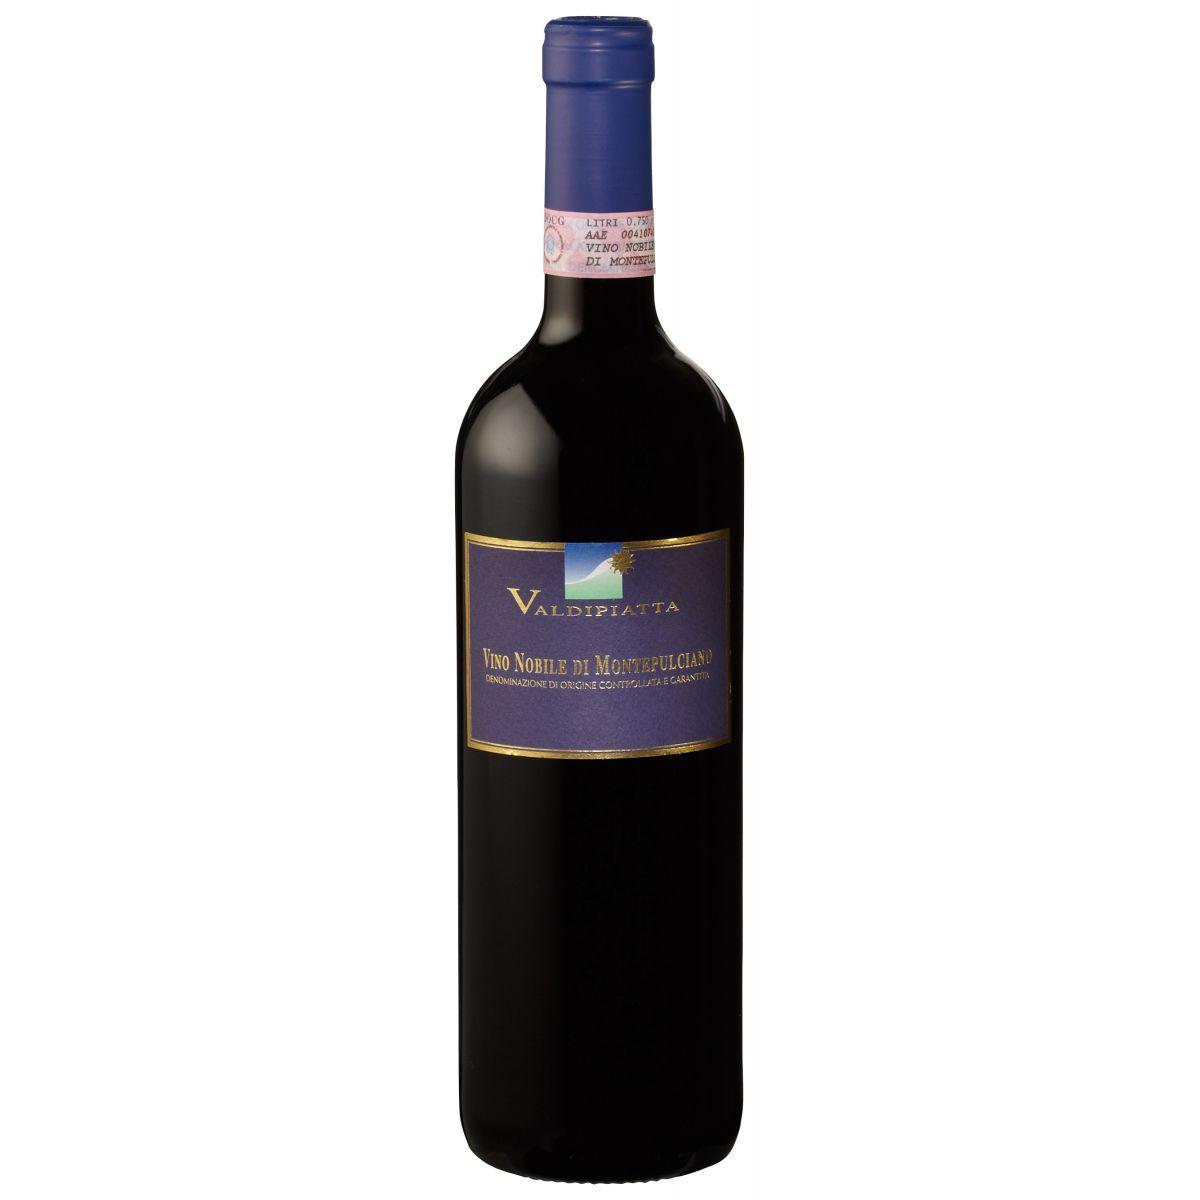 Valdipiatta Vino Nobile Montepulciano 750ml